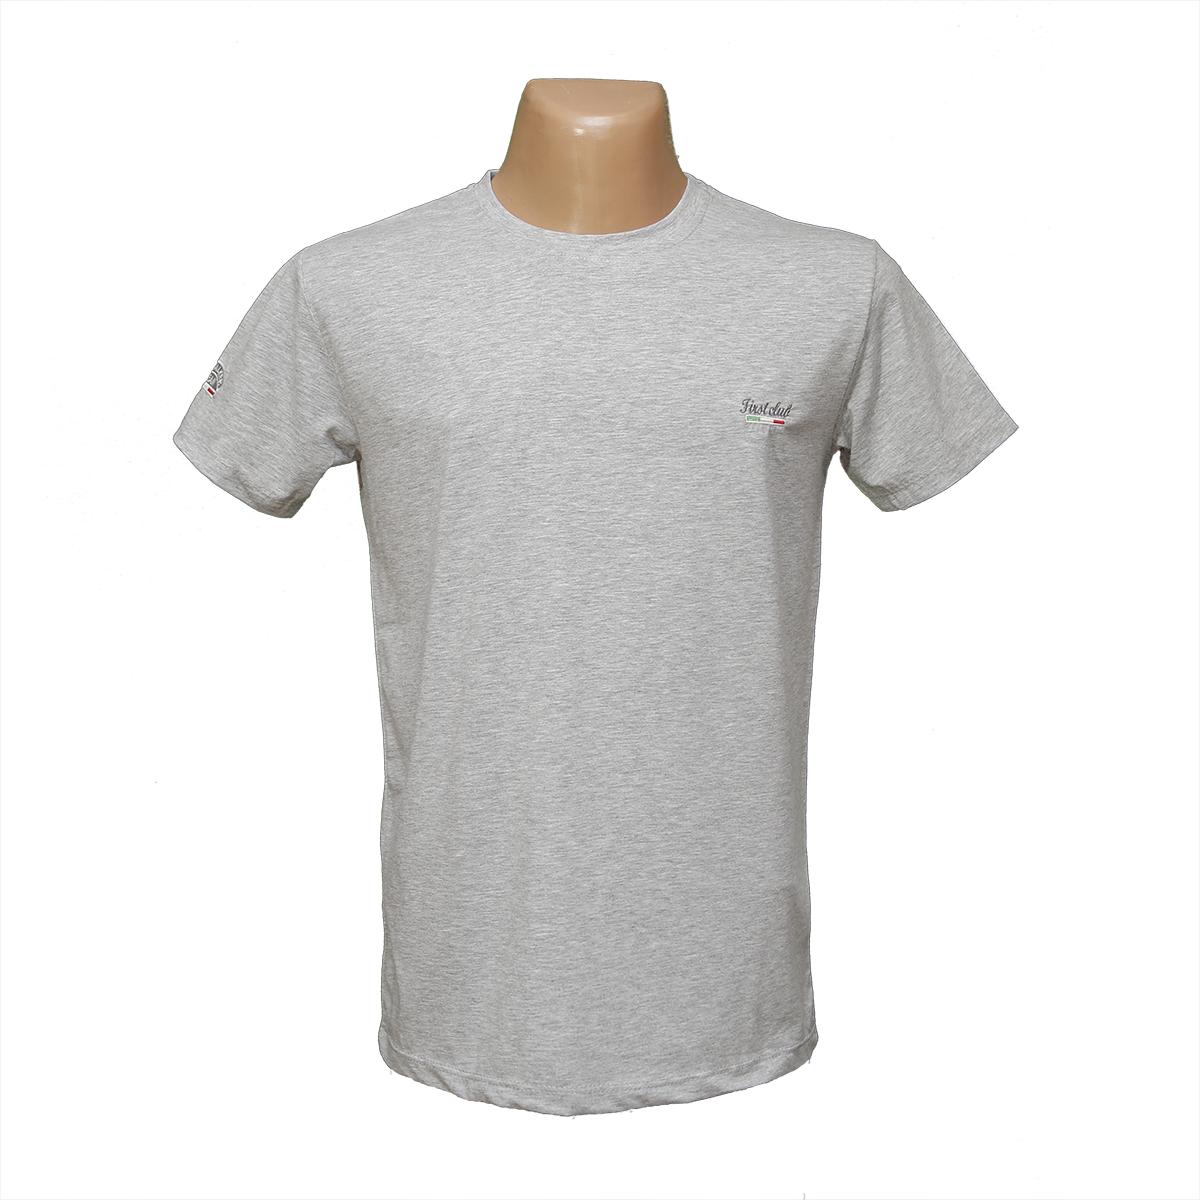 Мужская стрейчевая футболка Lycra тм. BY Walker. пр-во Турция 4035-6